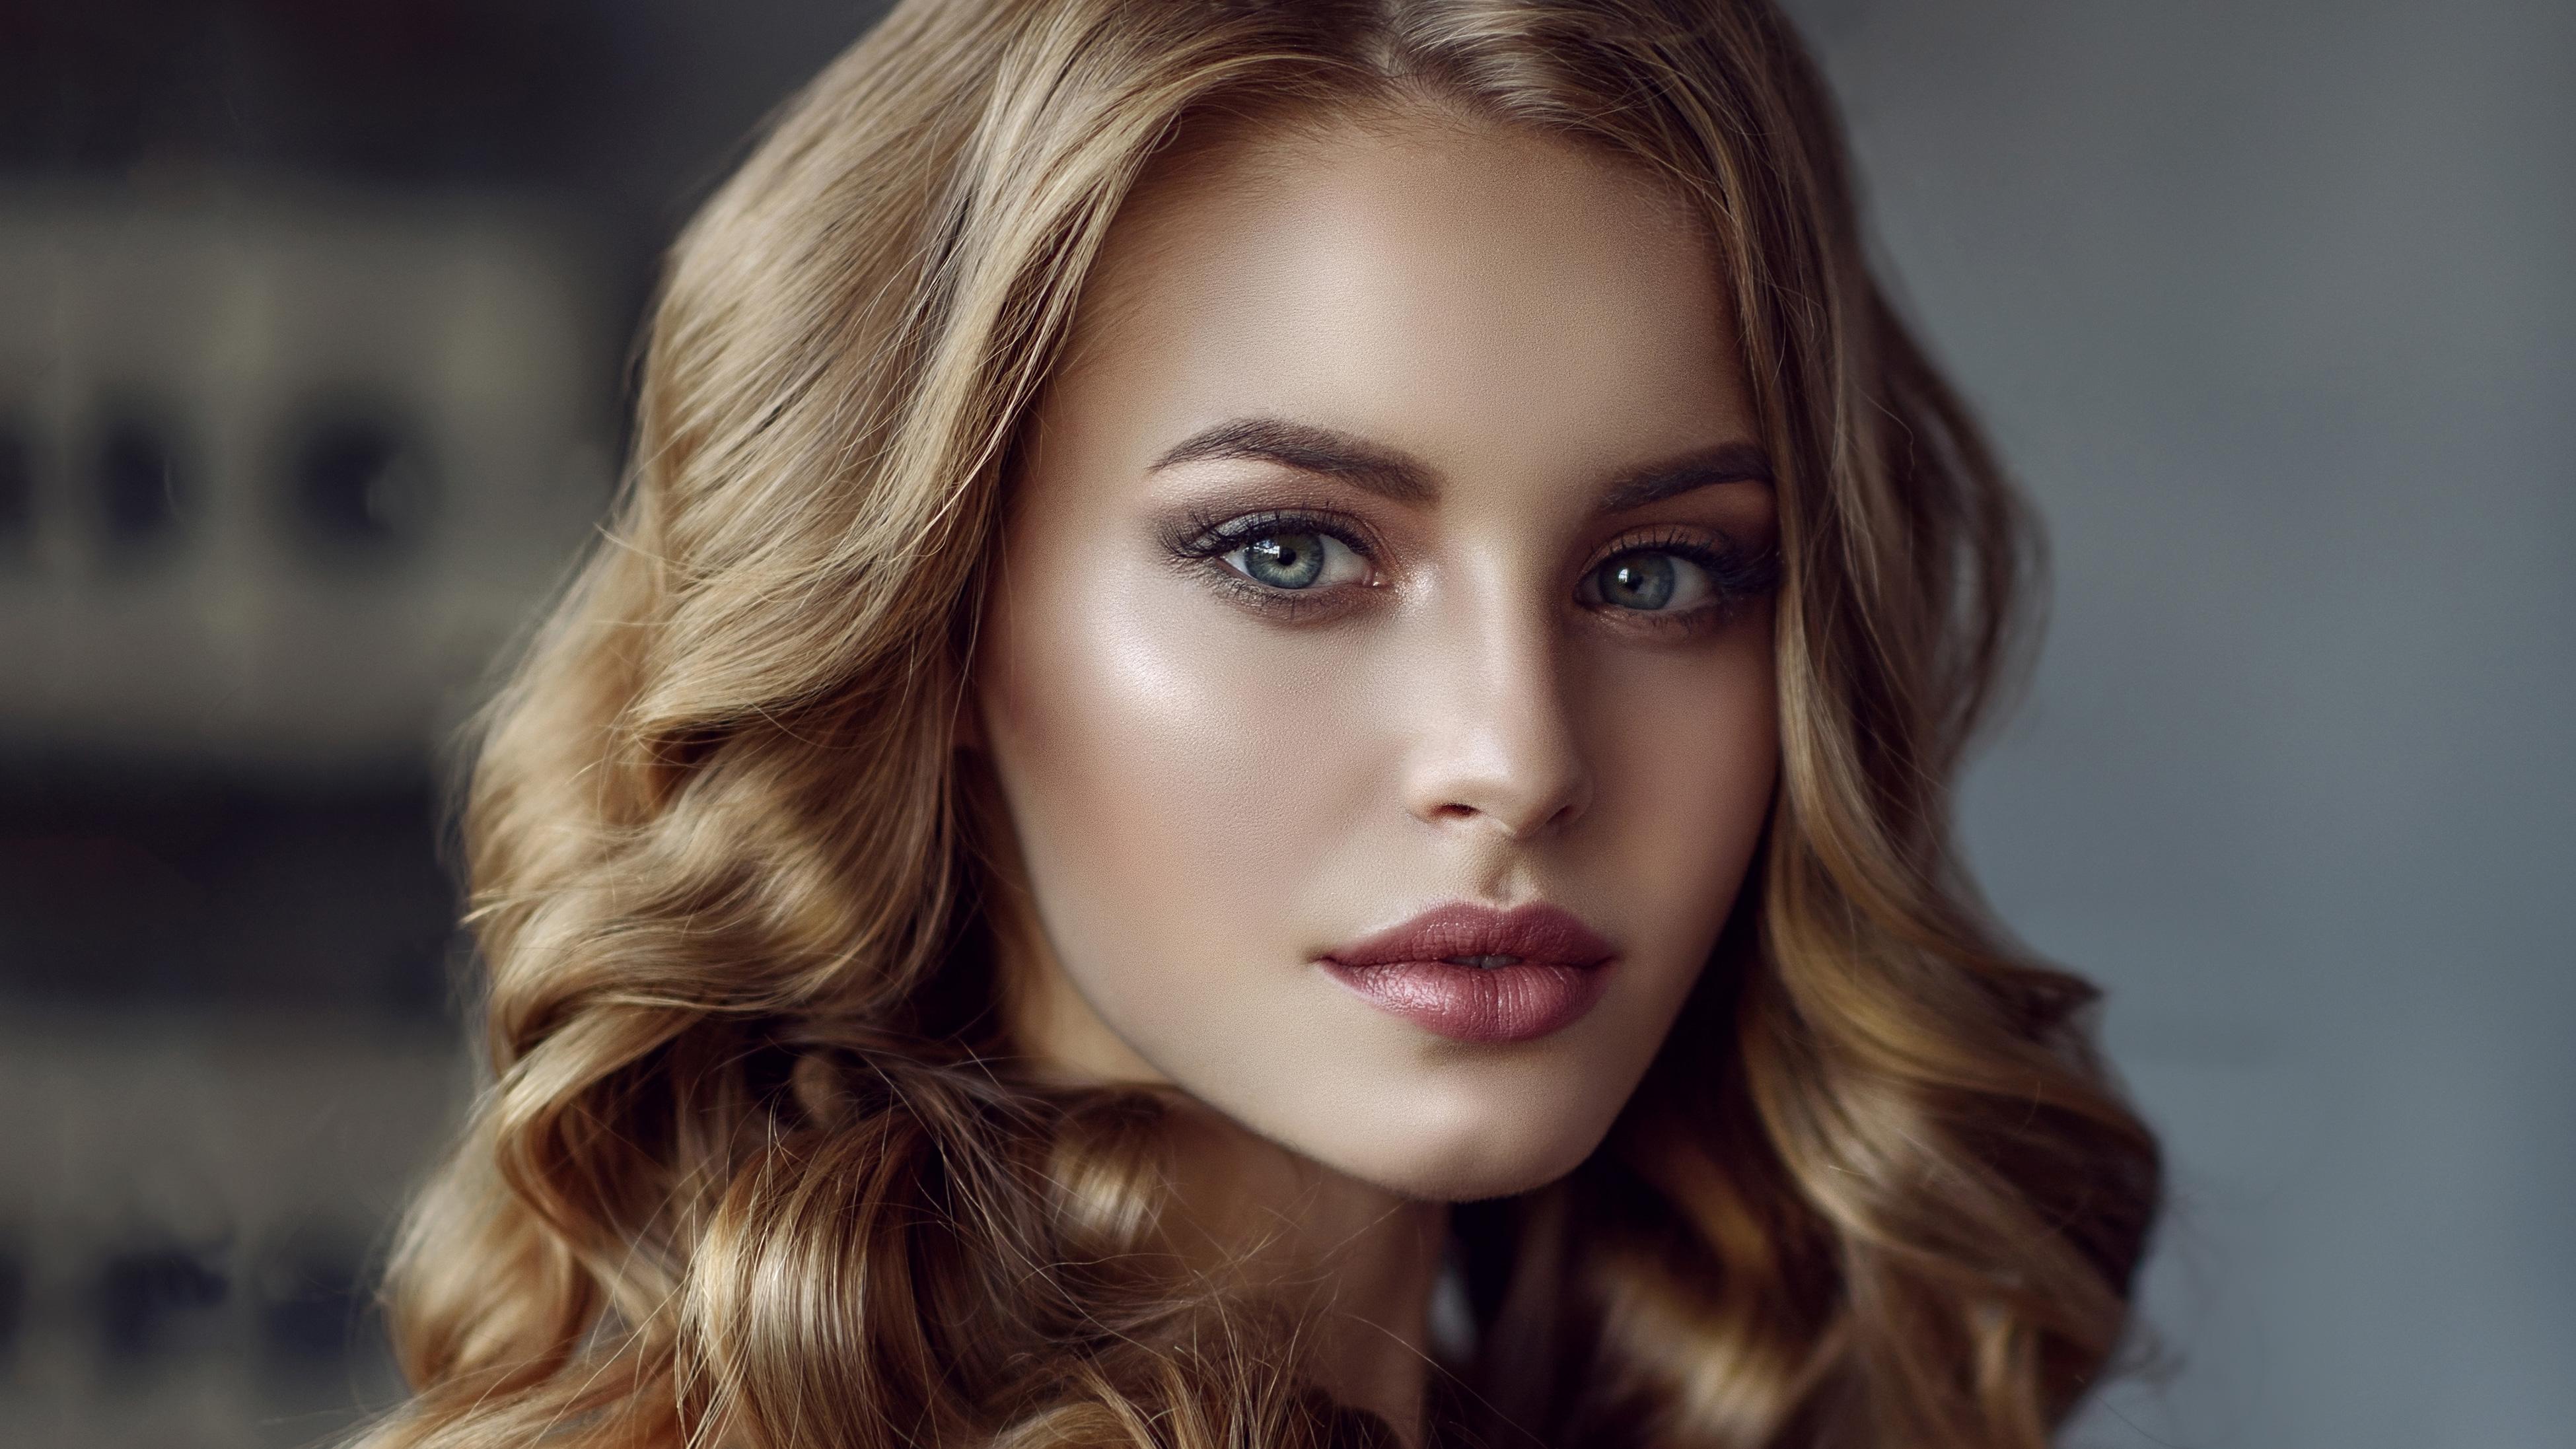 Beautiful Face Blonde Girl 4k, HD Girls, 4k Wallpapers